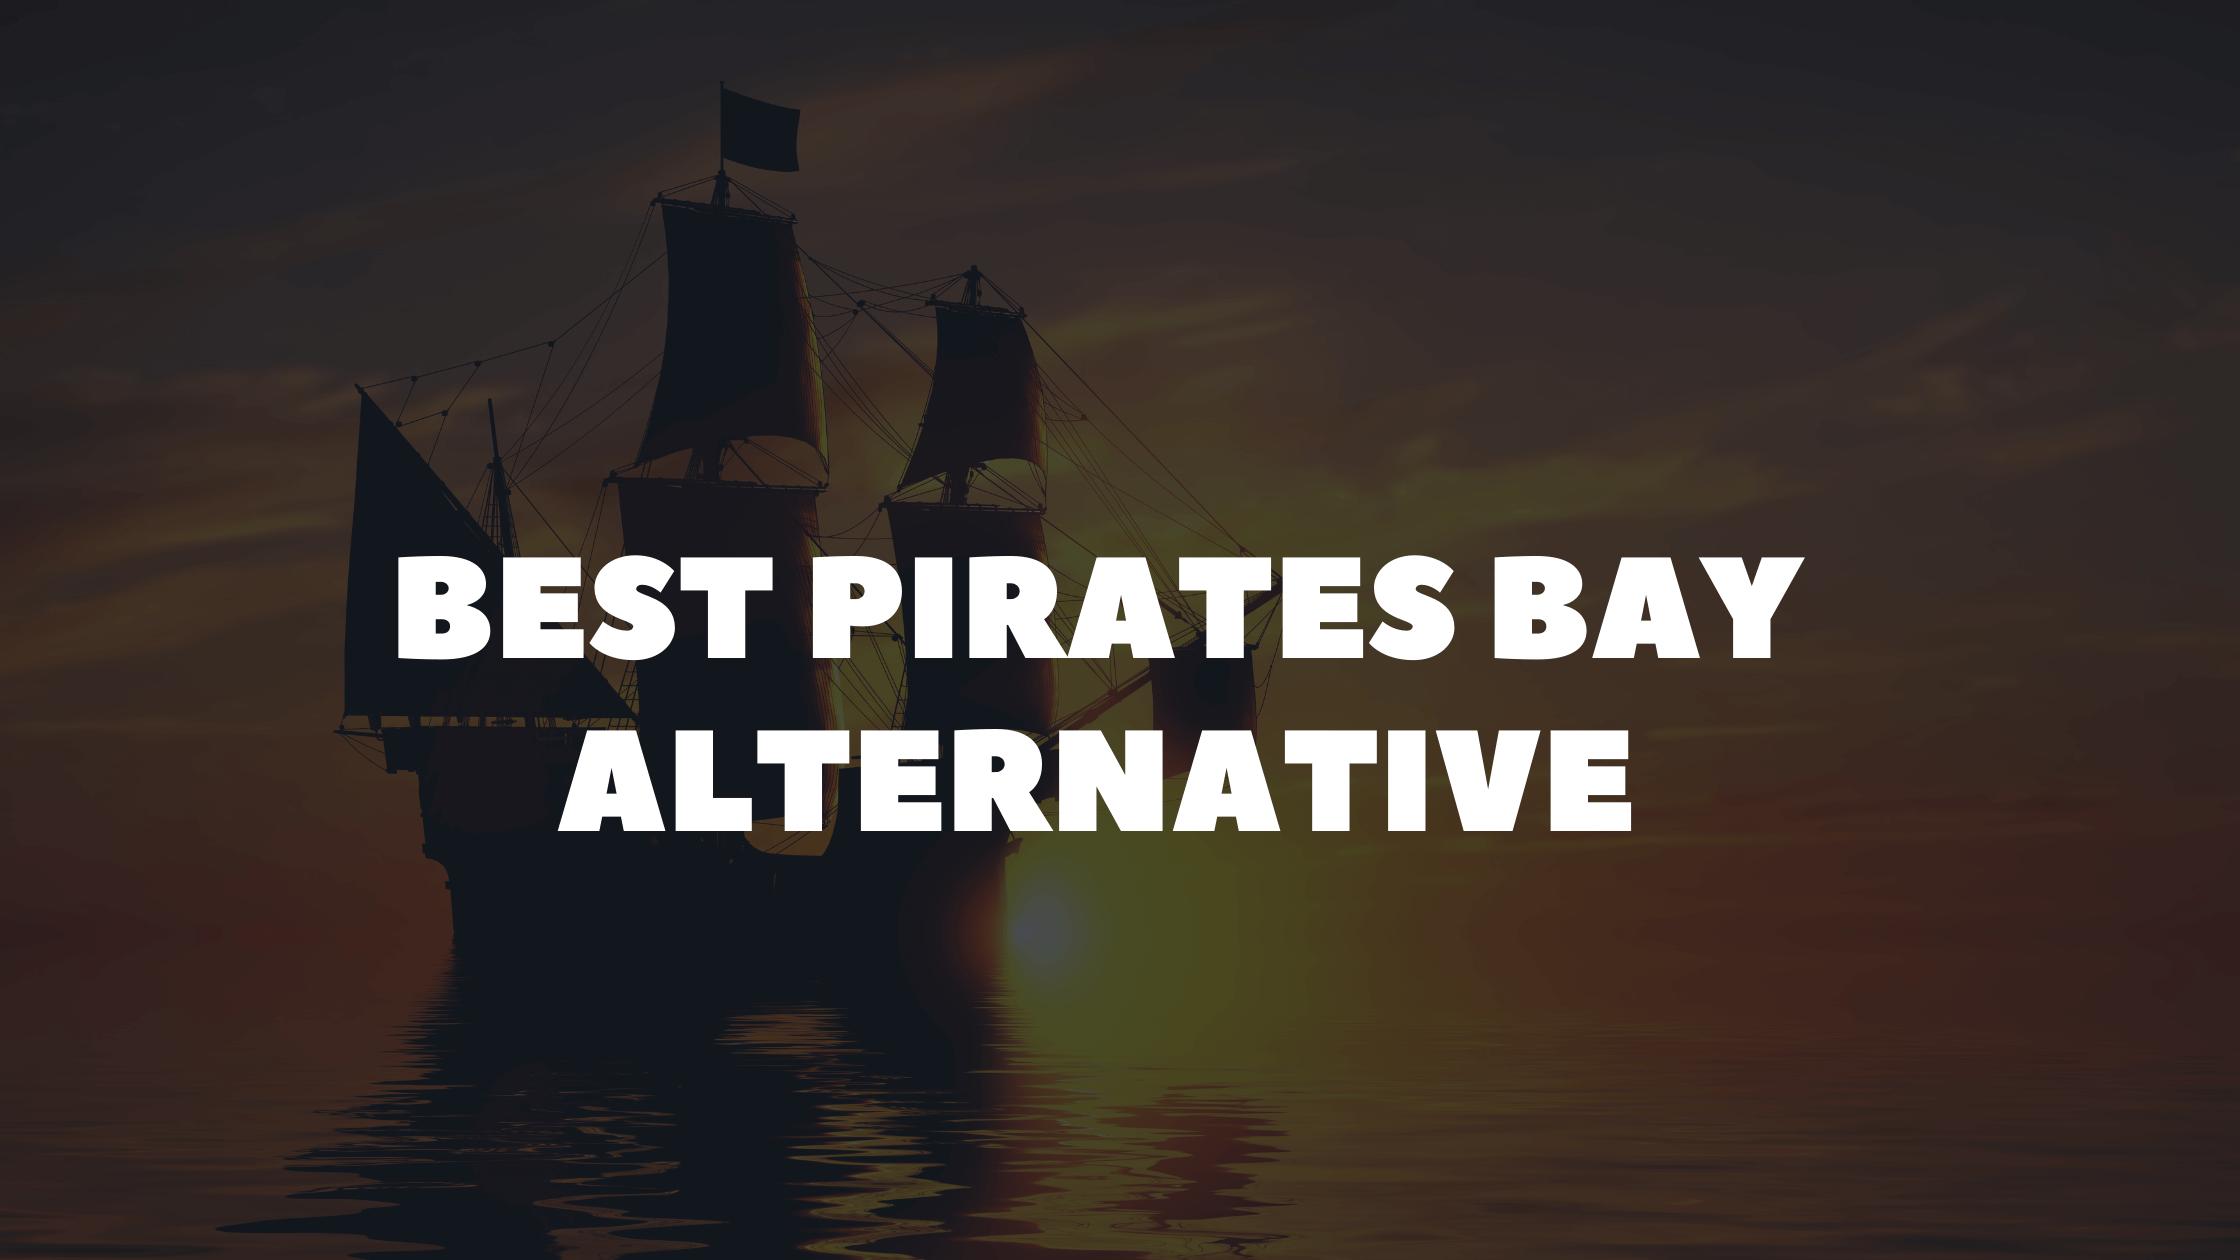 Pirates bay alternative